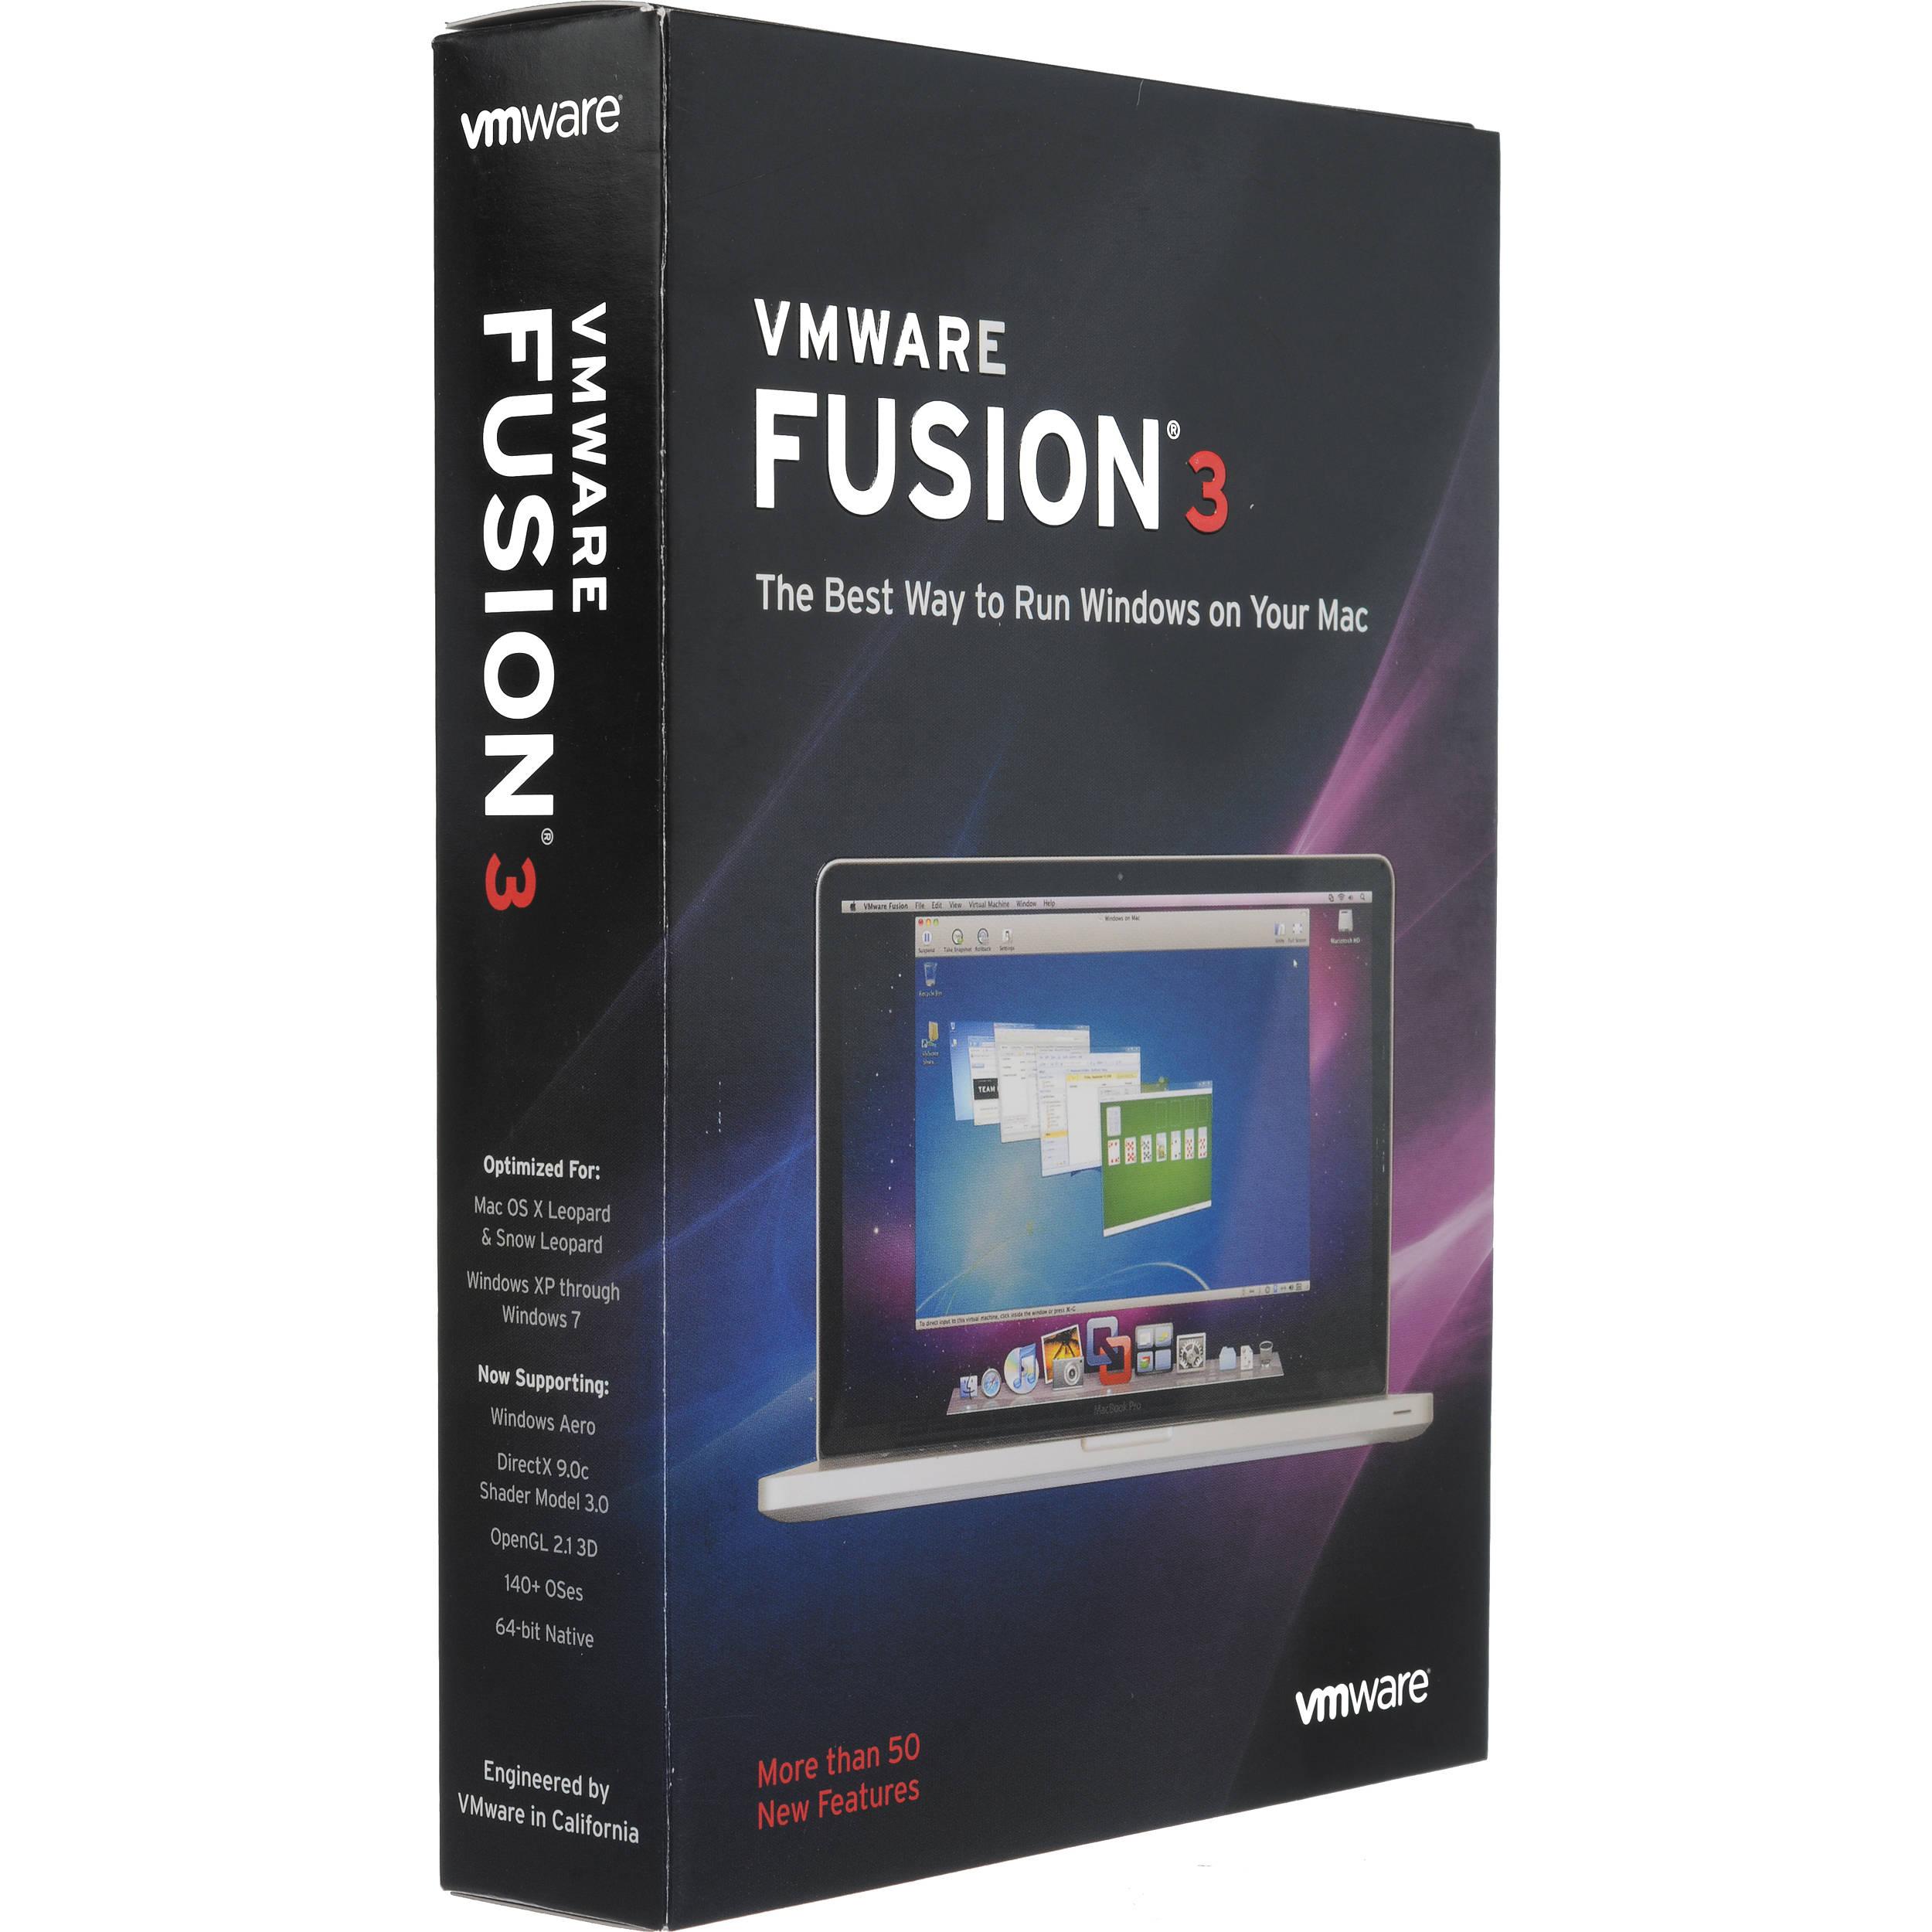 VMware Fusion 3 Software for Mac OS X